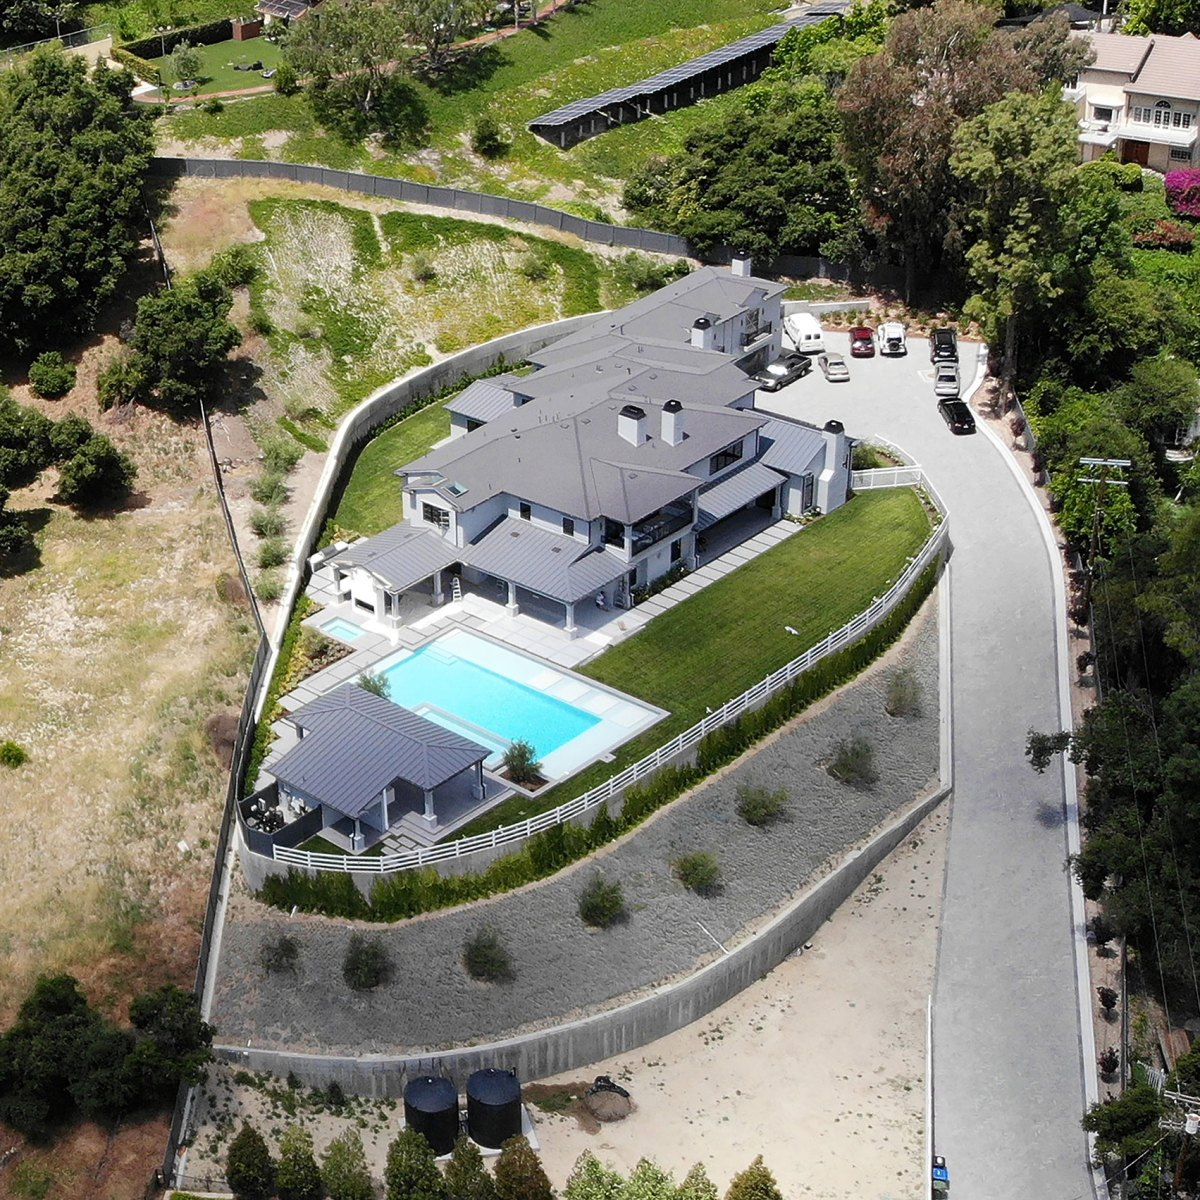 Blake Shelton And Gwen Stefani S New House Photos Of Encino Mansion